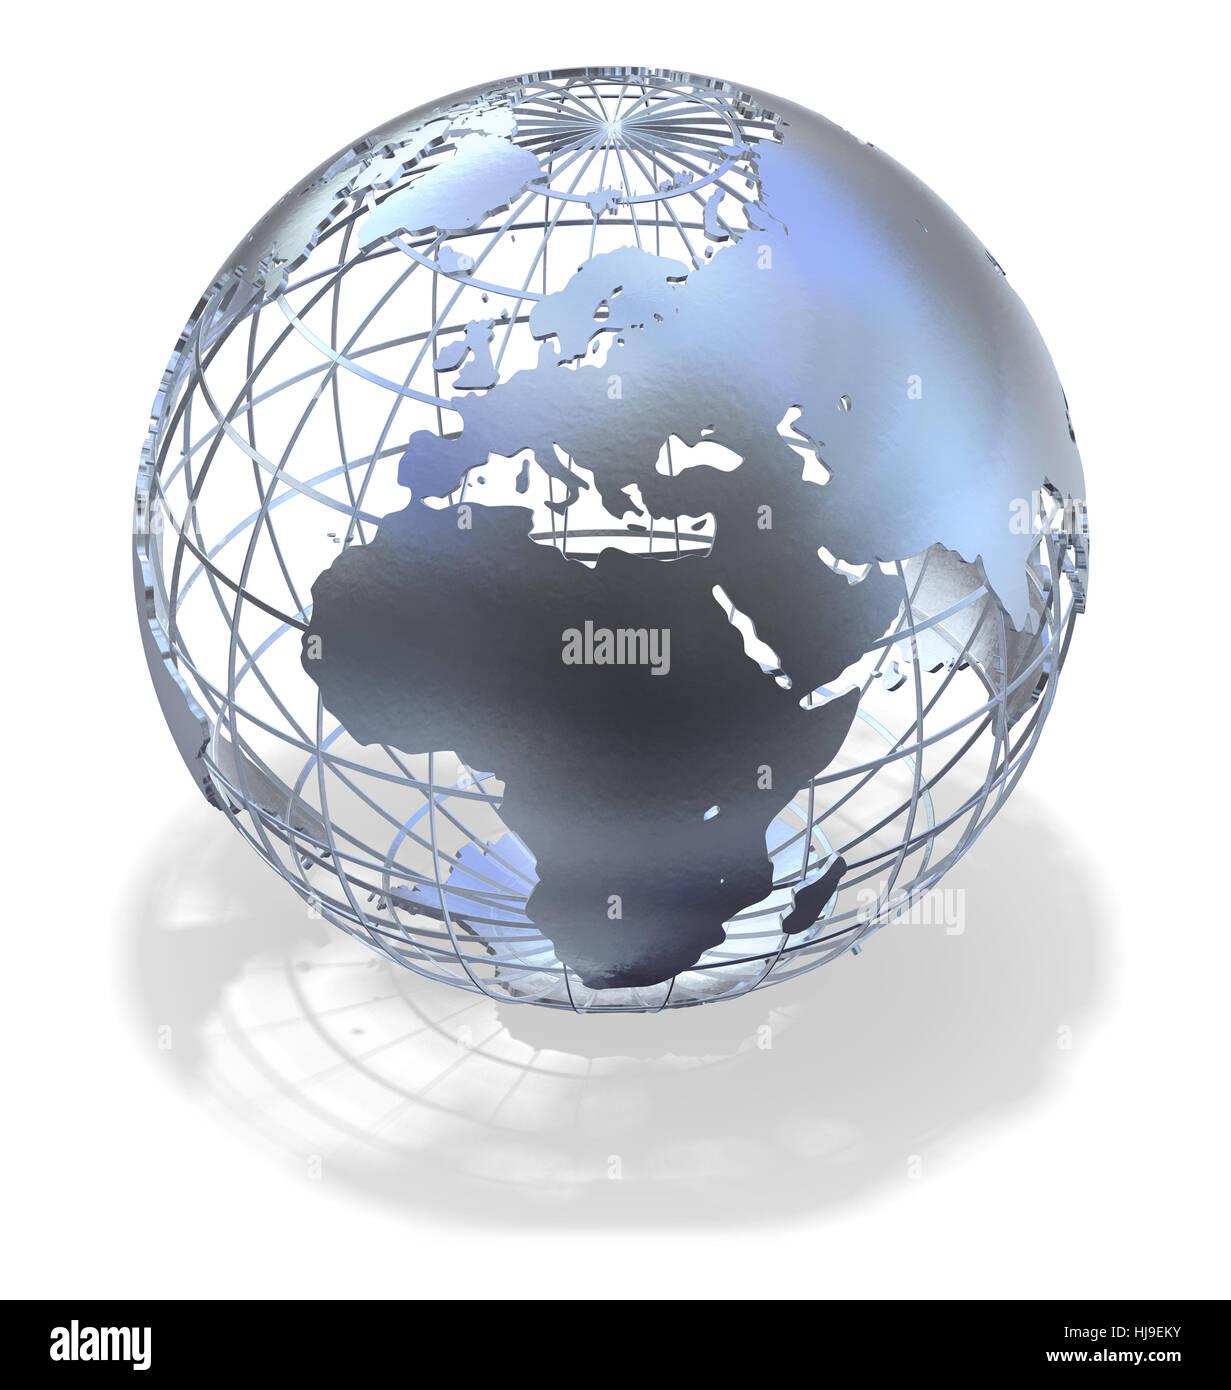 World Map Globe Ball. globe  planet earth world sphere map atlas of the ball asia